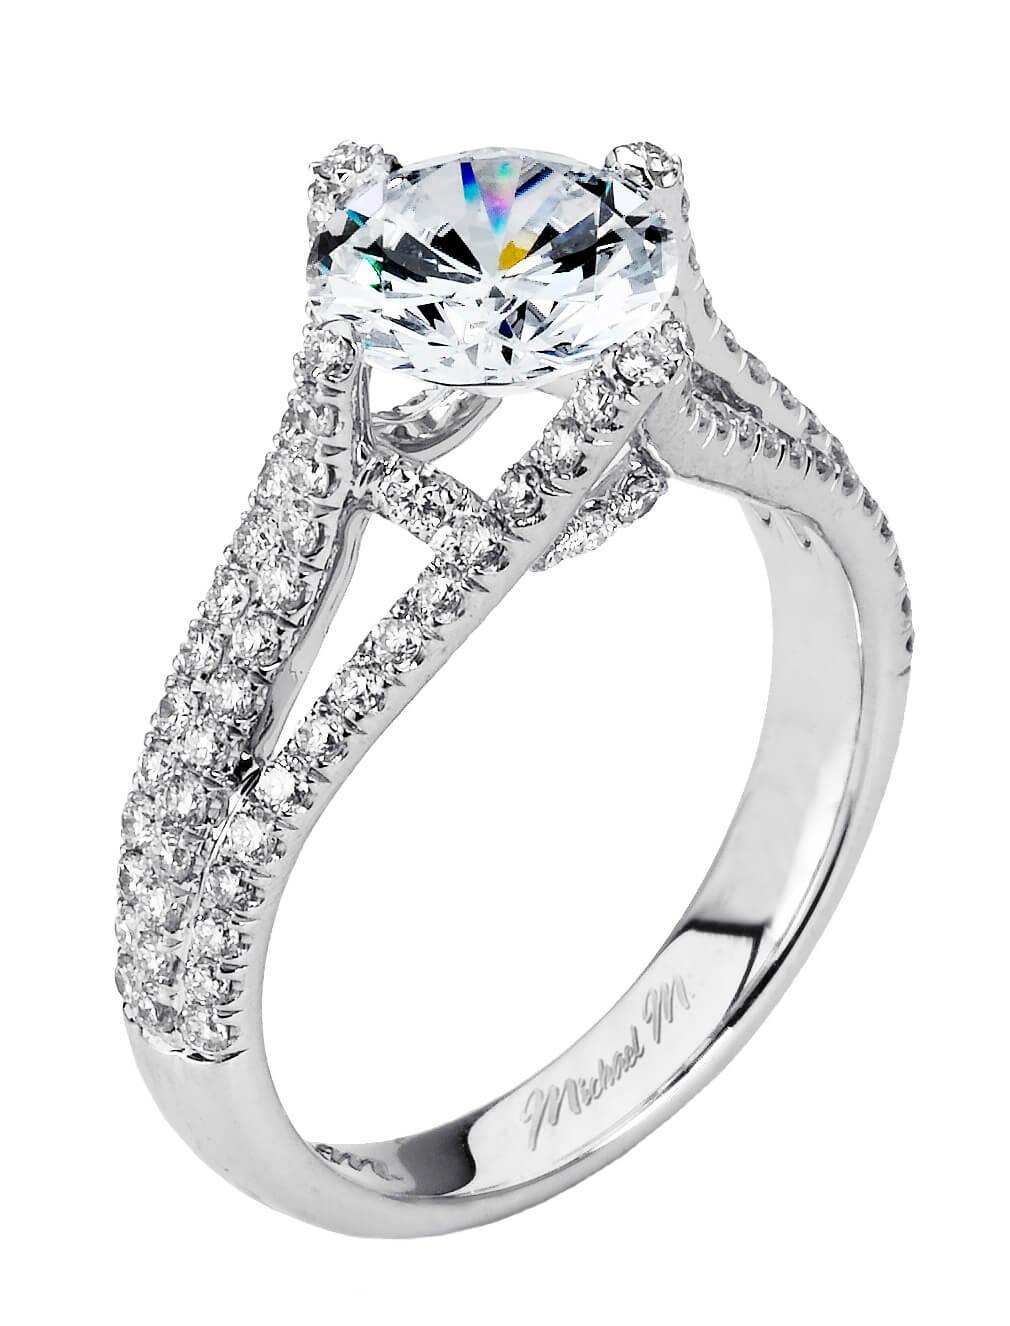 zadok jewelers weddings in houston - Wedding Rings Houston